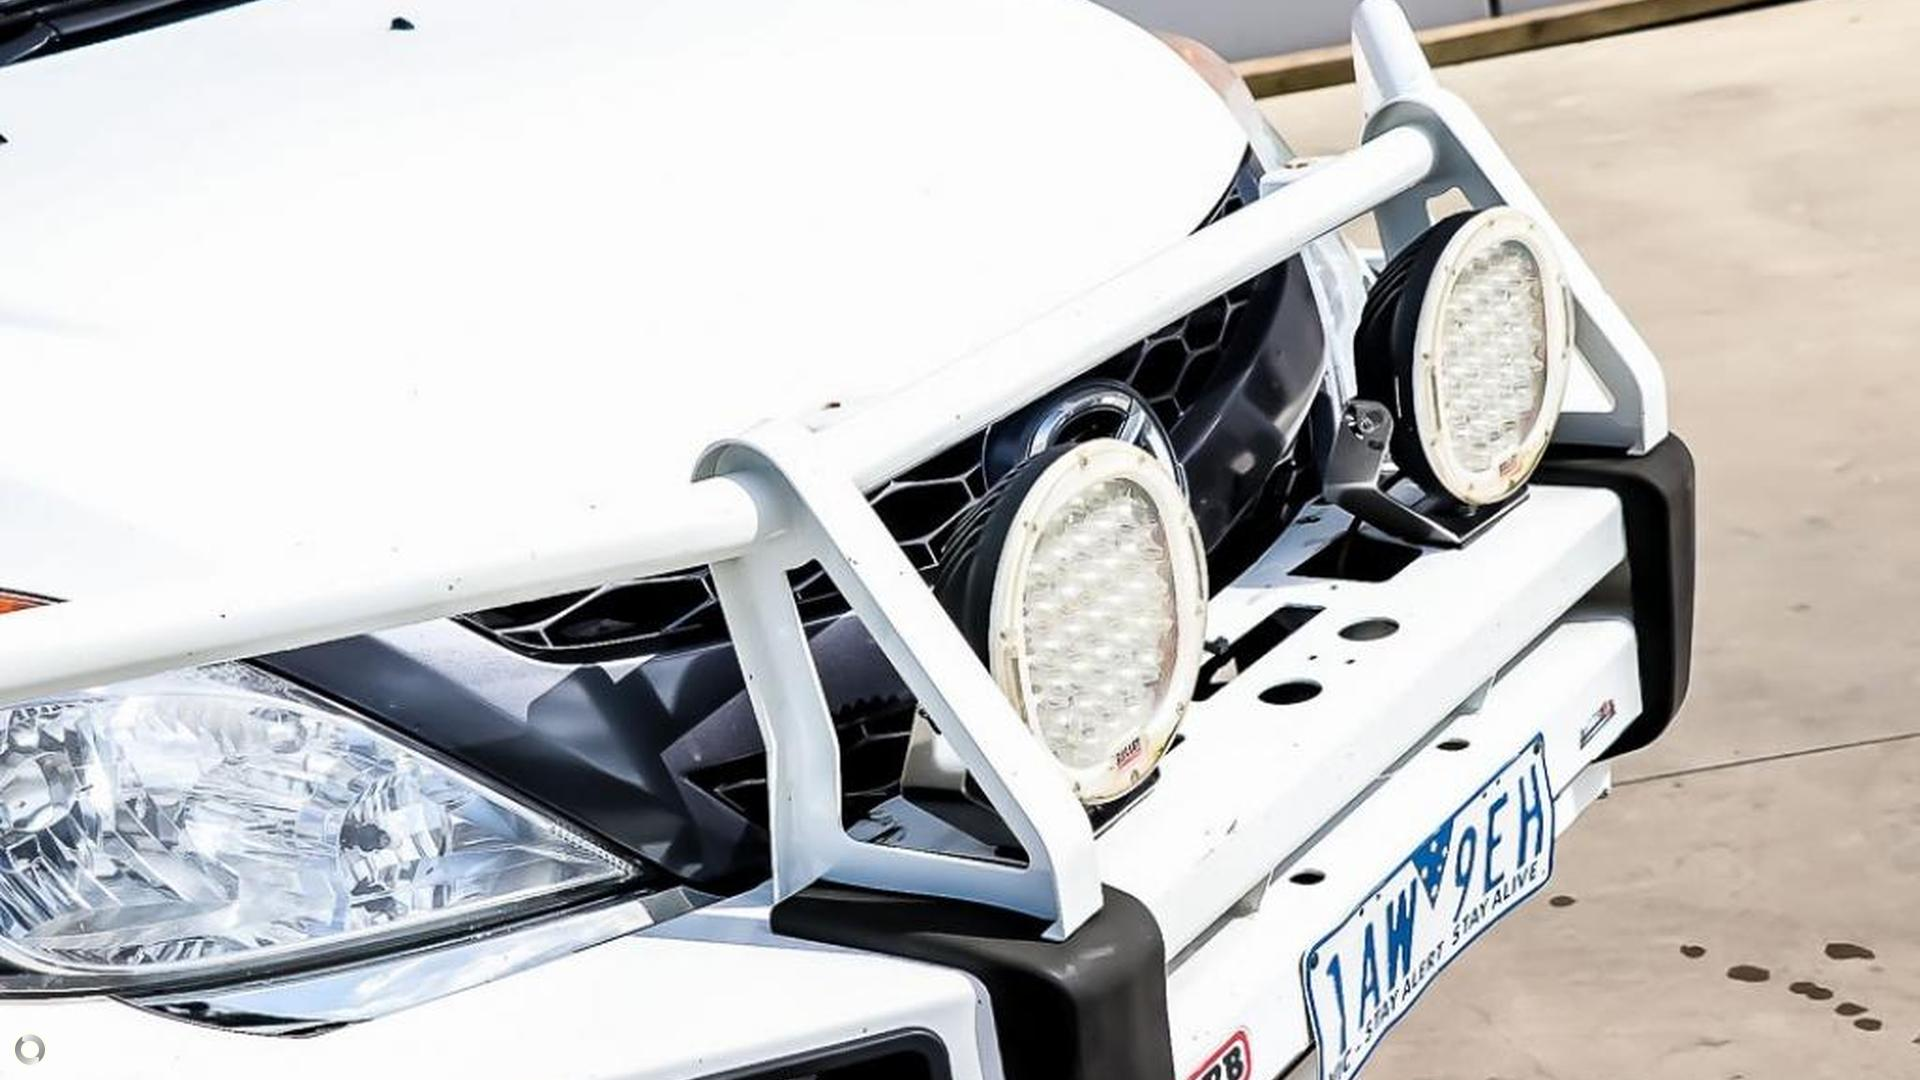 2013 Mazda Bt-50 XTR Hi-Rider UP